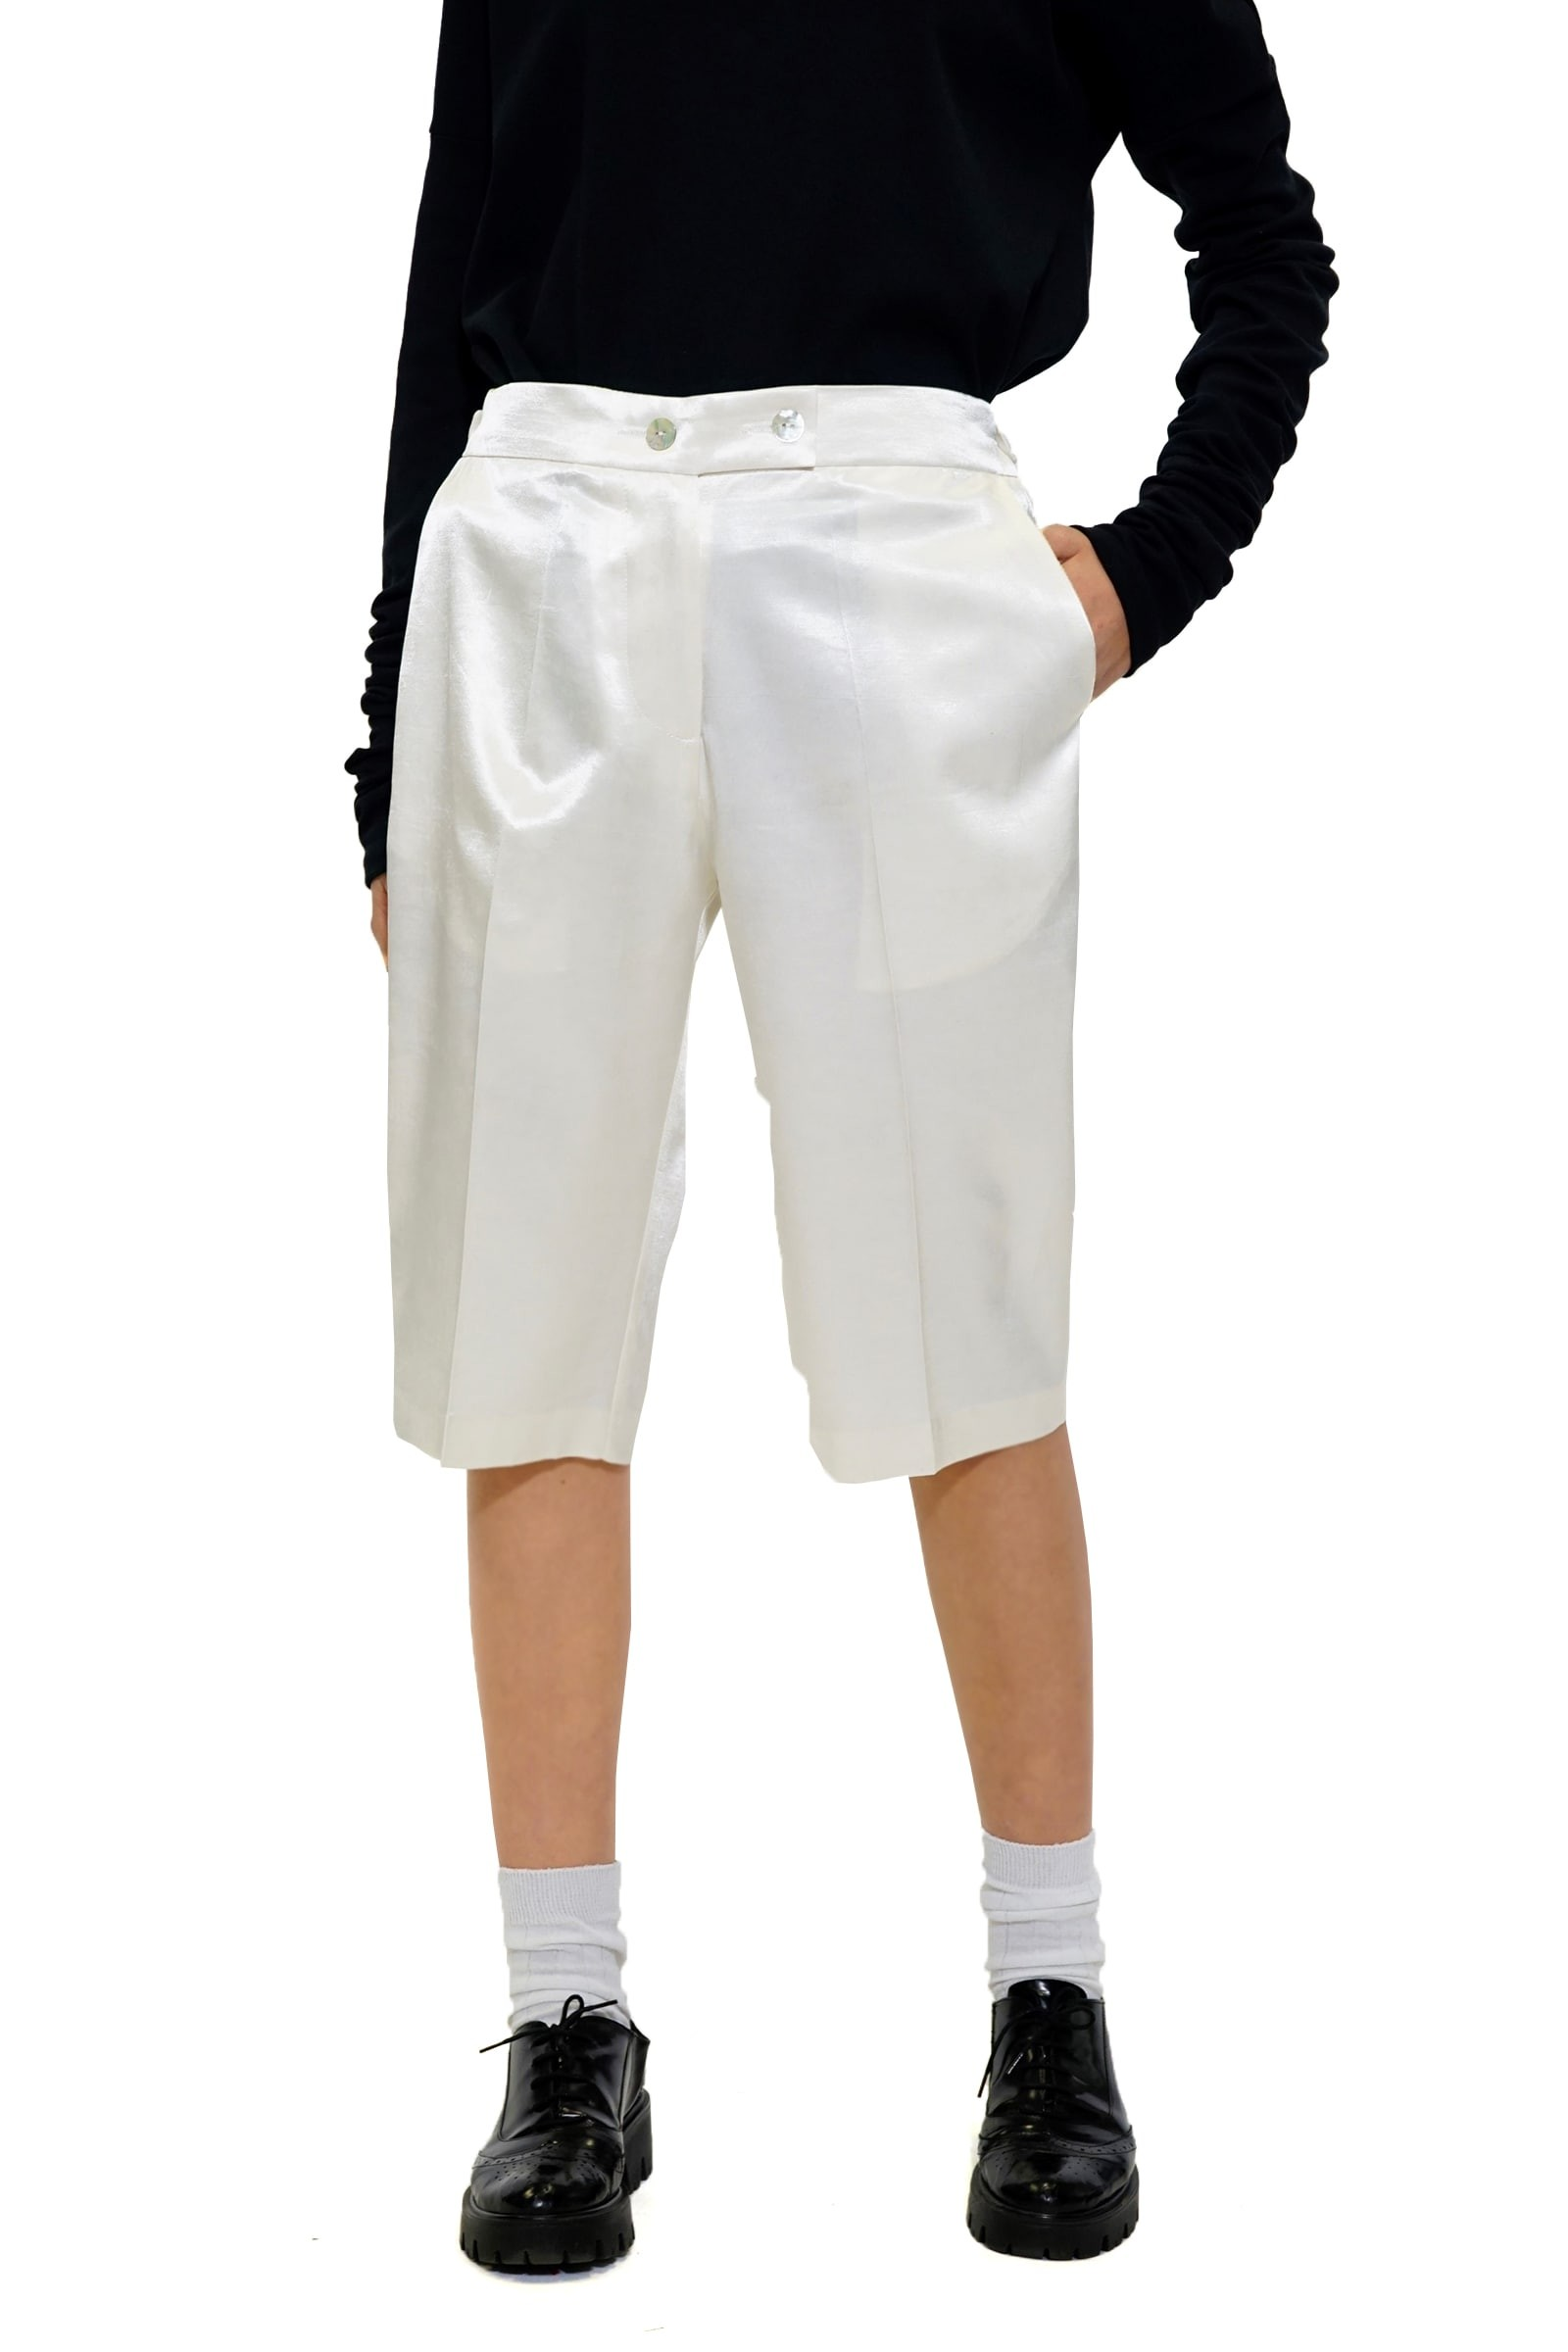 Short white pants